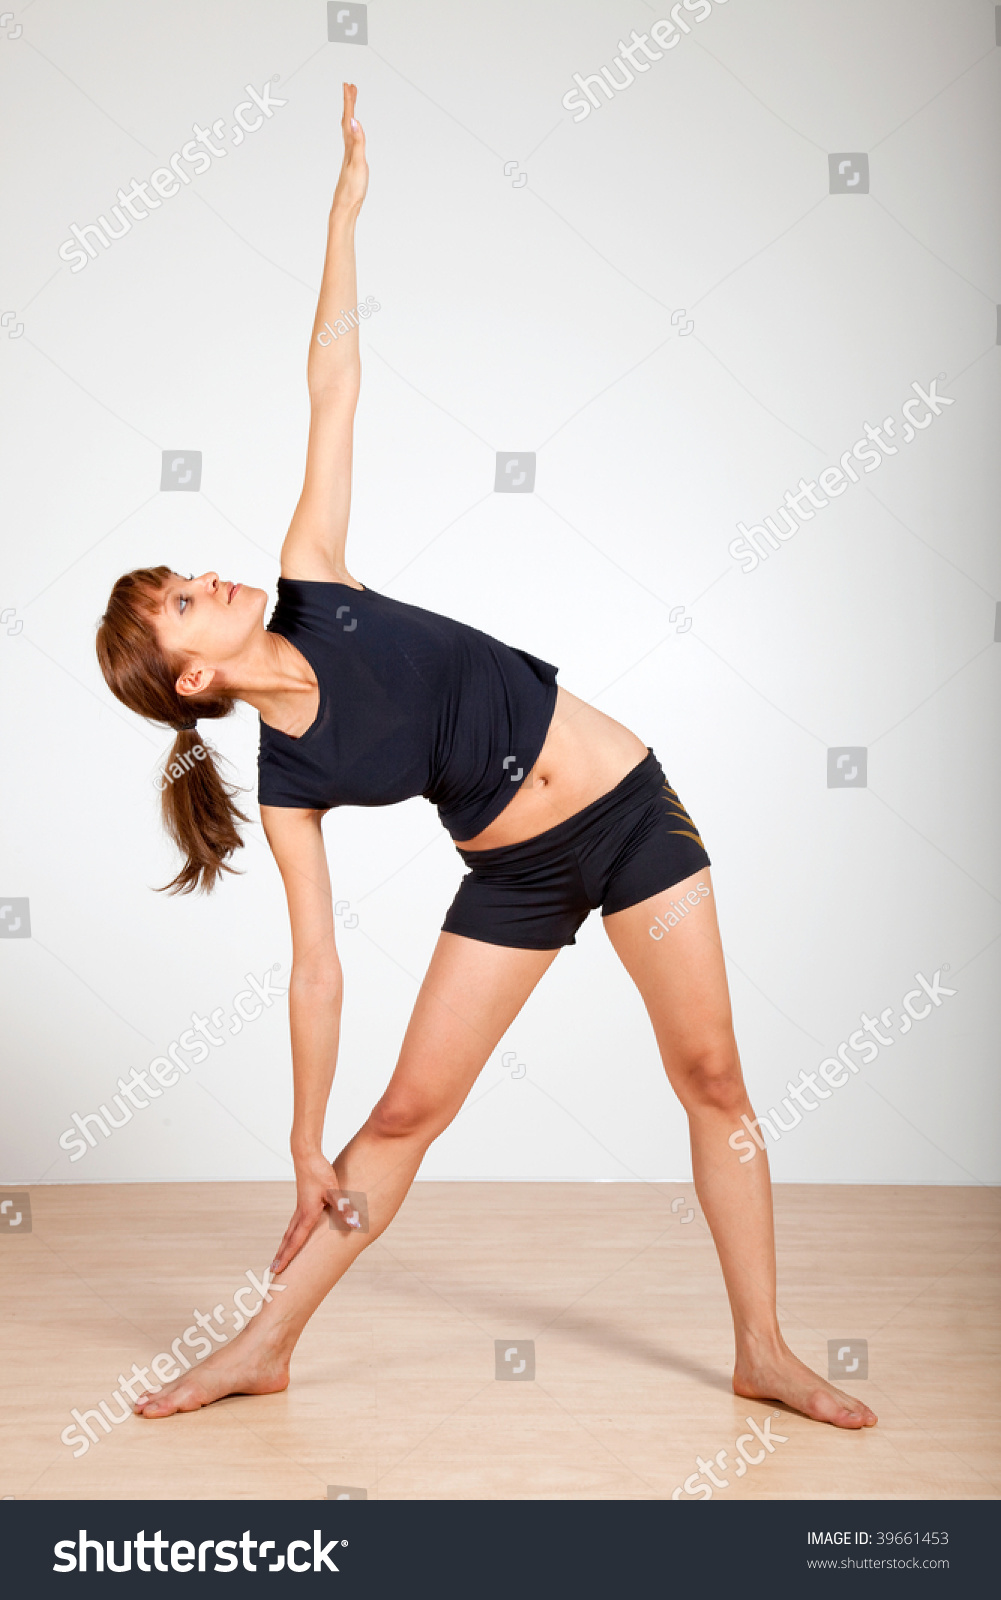 yoga extended triangle pose imagen de archivo stock 39661453 shutterstock. Black Bedroom Furniture Sets. Home Design Ideas